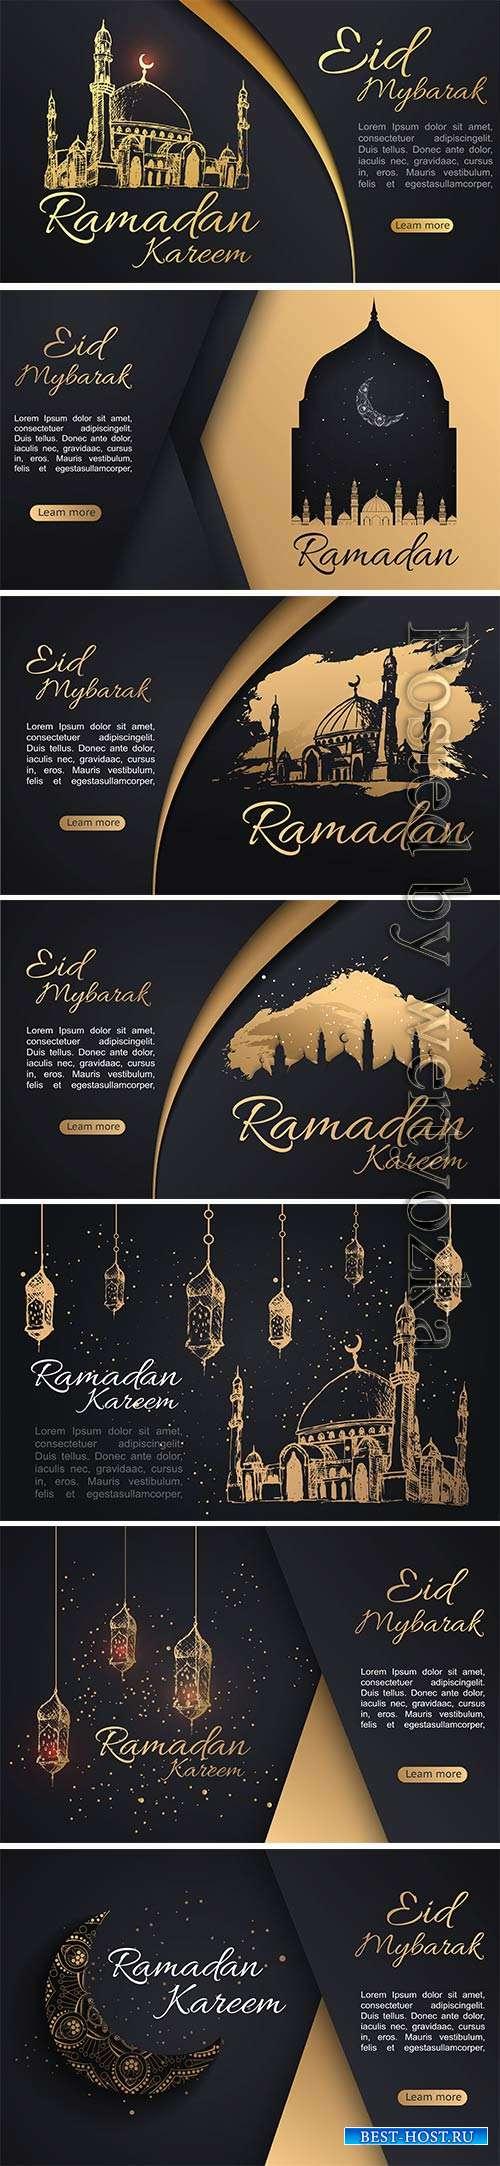 Ramadan Kareem islamic greeting watercolor sketch background